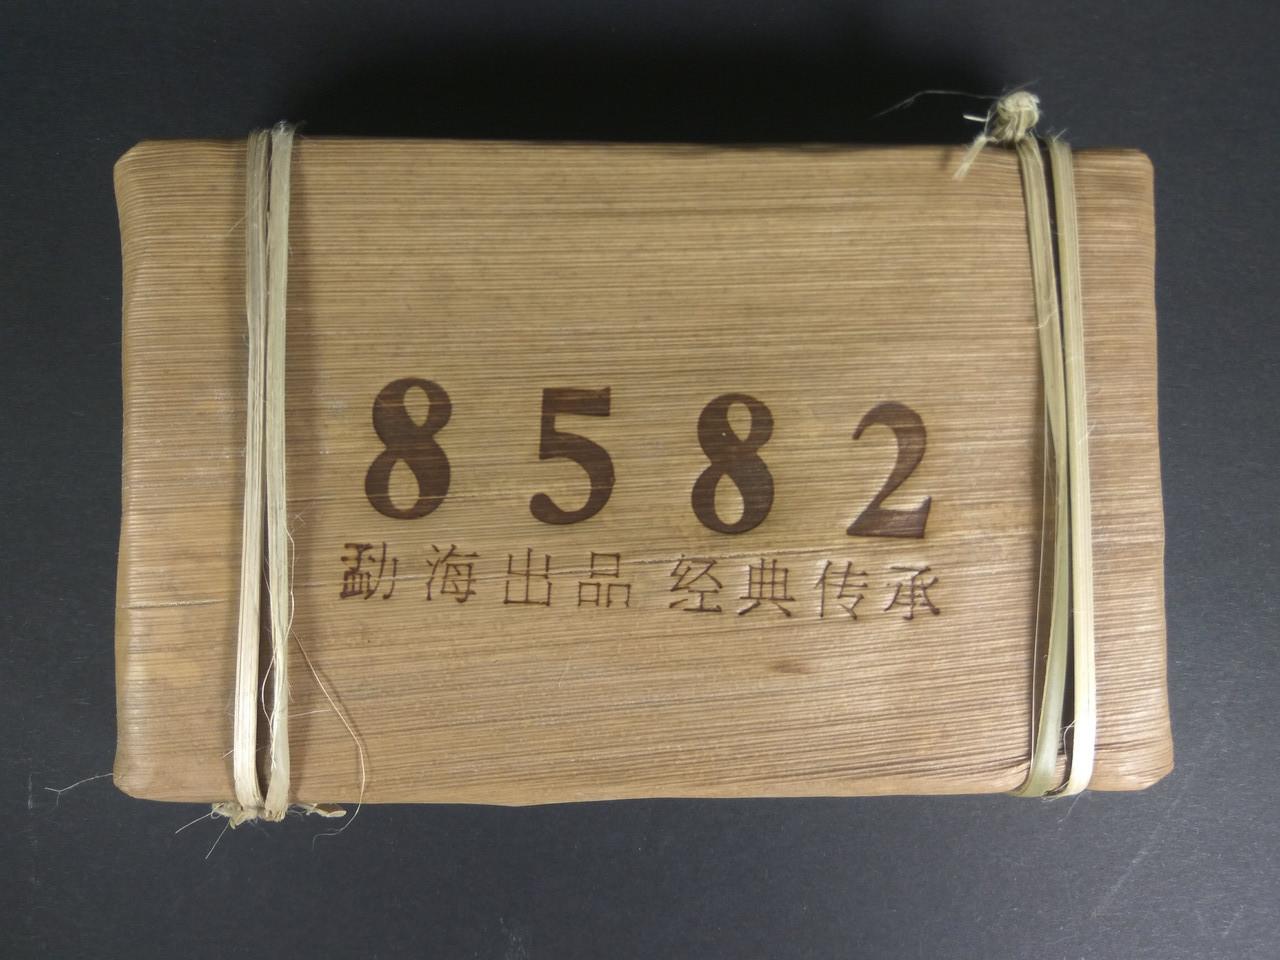 Чай шен пуэр зеленый Menghai Tea рецепт 8582 бамбук 250 грамм